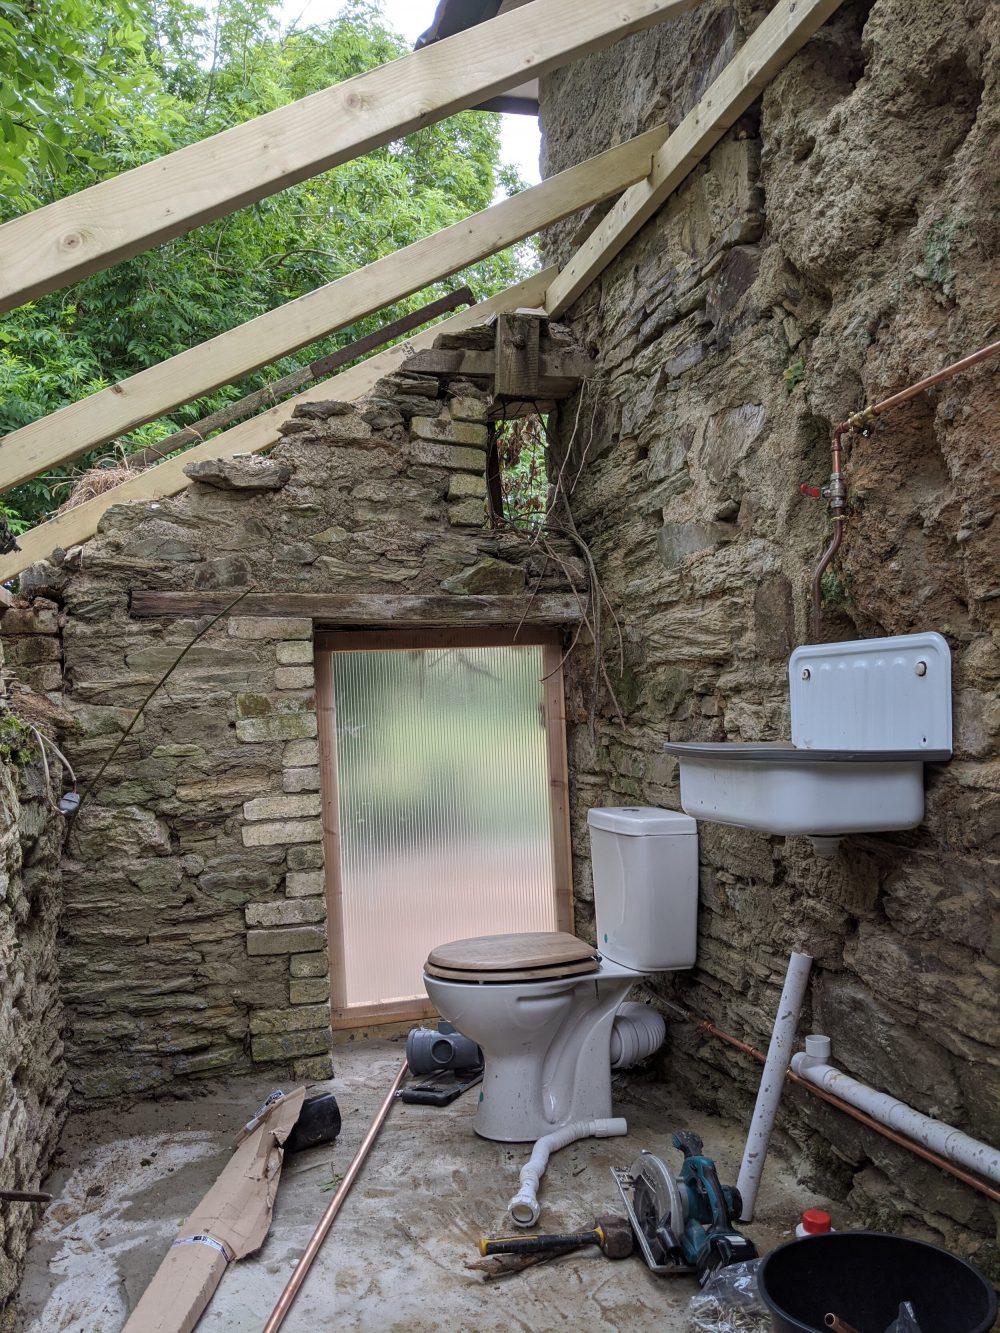 Plumbing in the new toilet, pre roof!